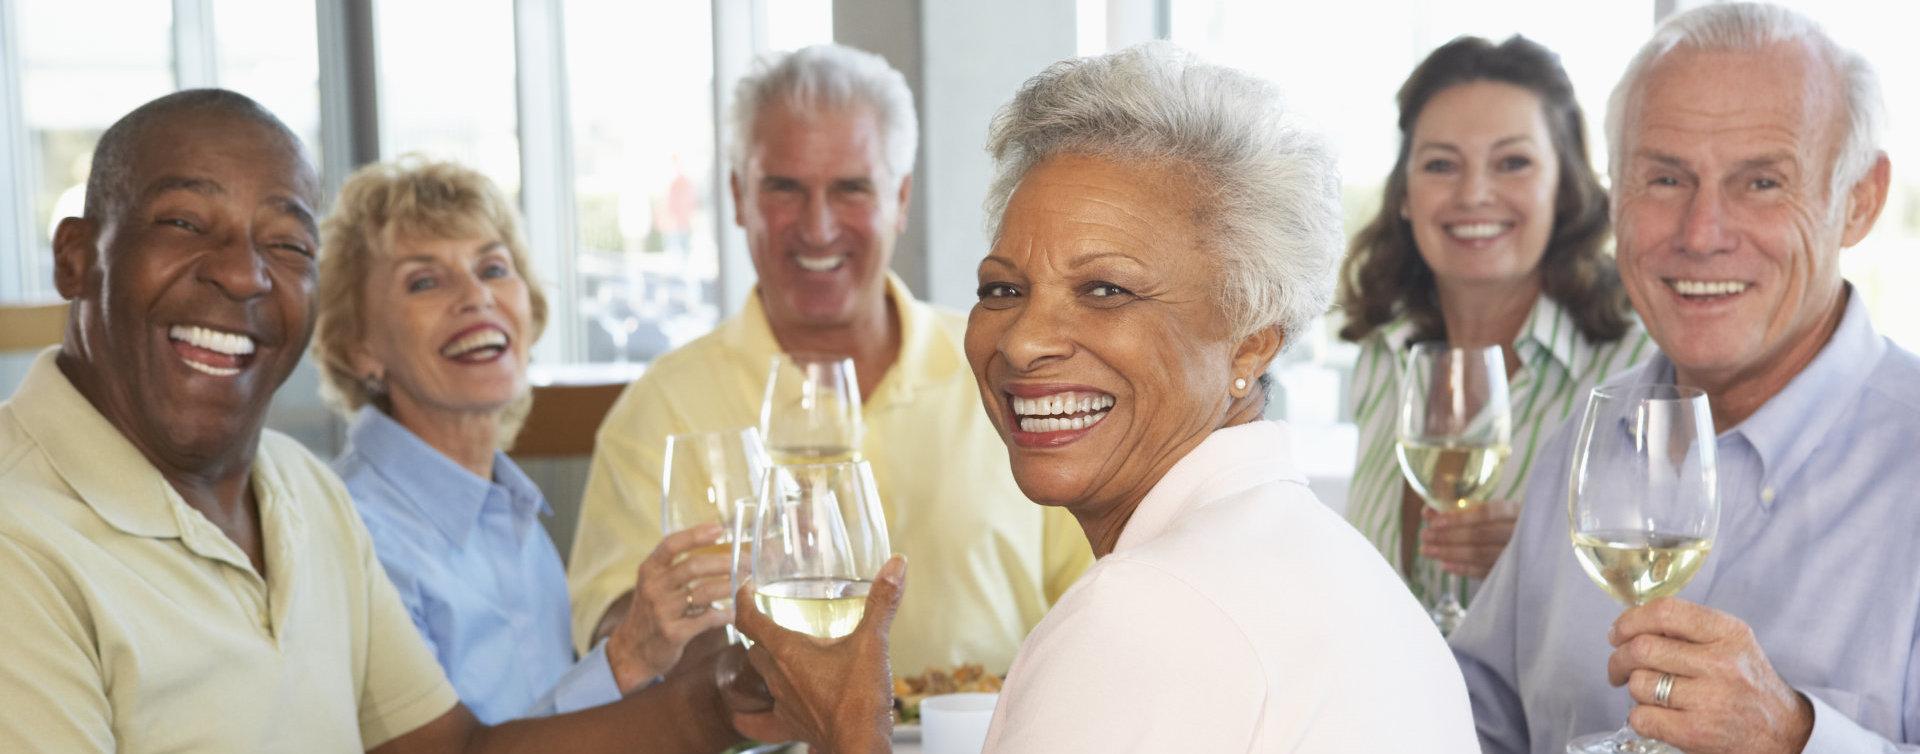 group of elderly having champagne toast